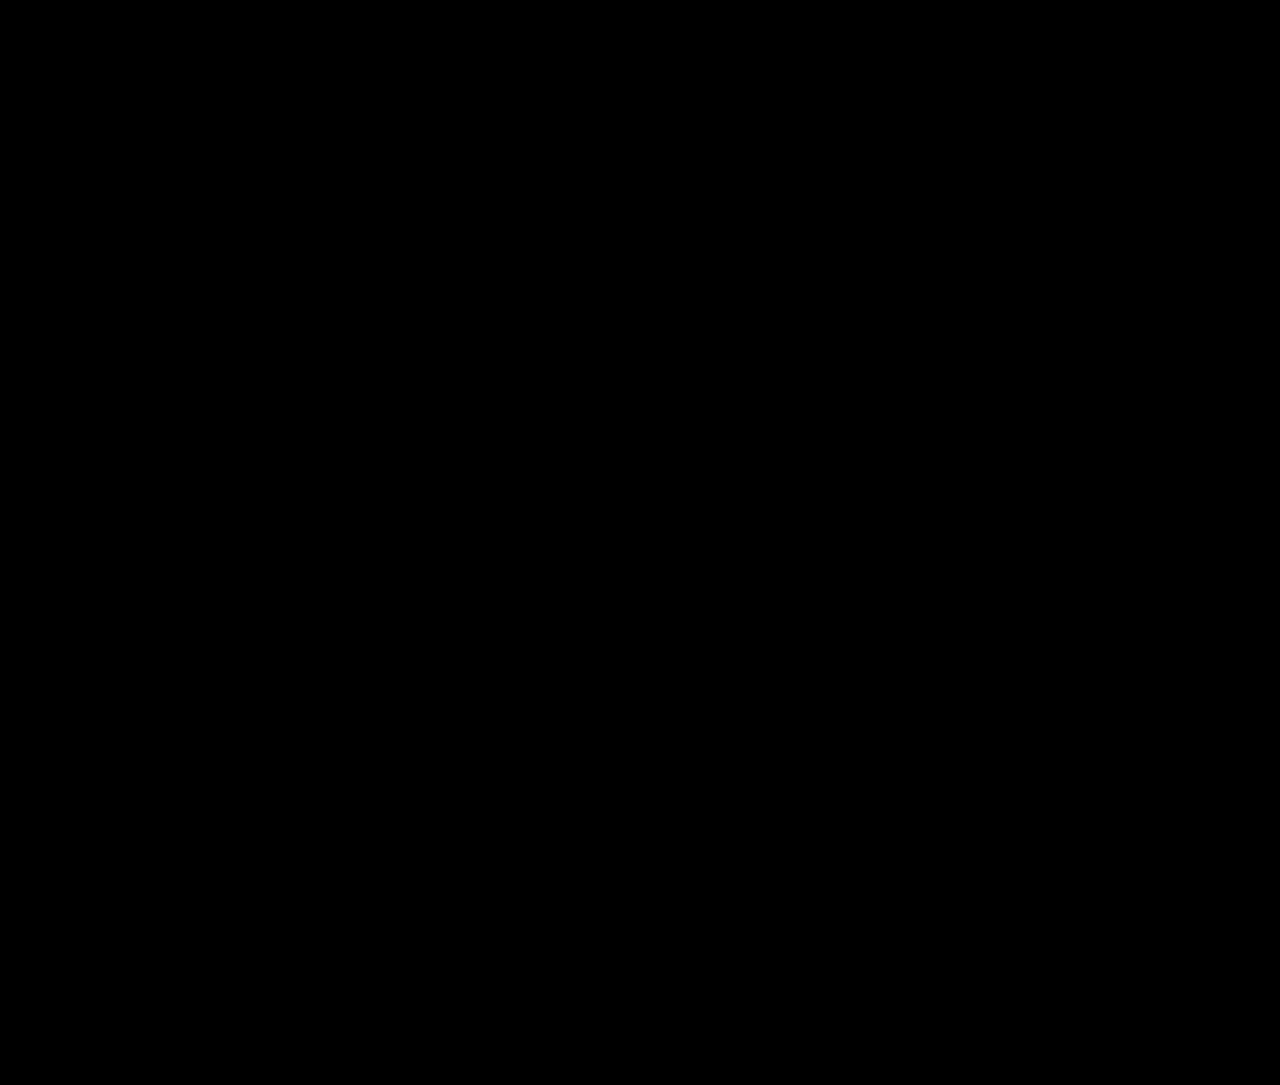 Ausmalbild: Faultier - Mottes Wunderwelt